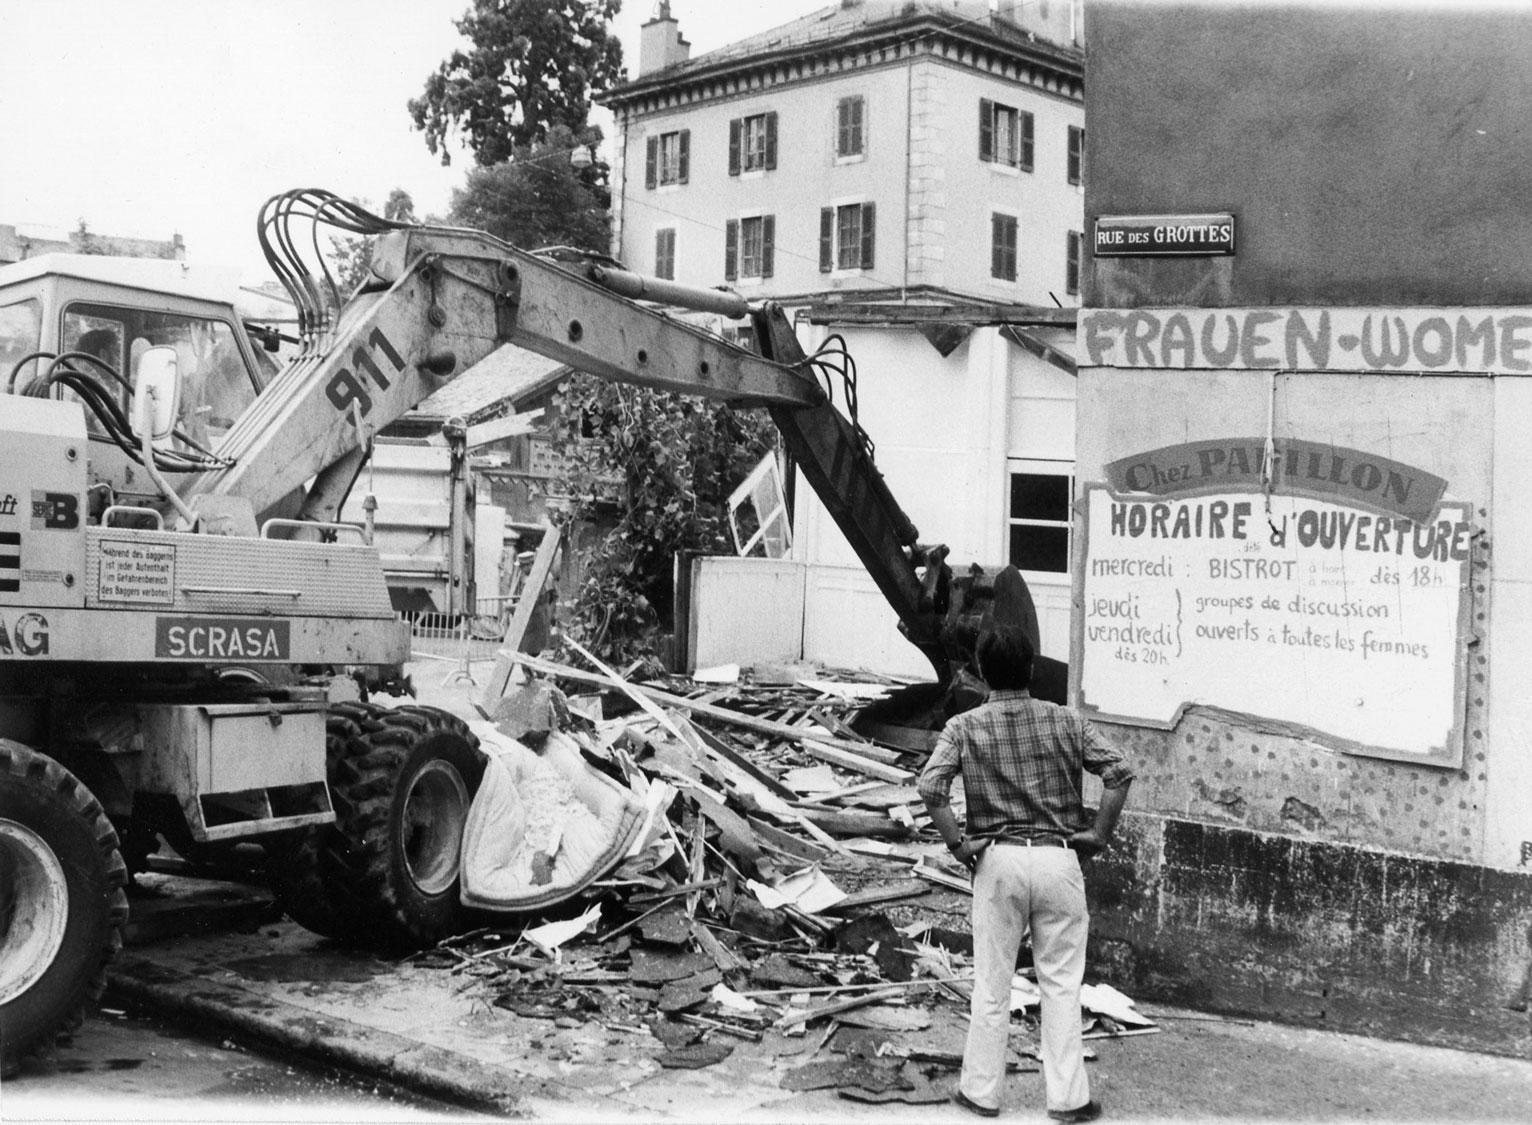 Destruction du Centre femmes du MLF, Genève, 1976